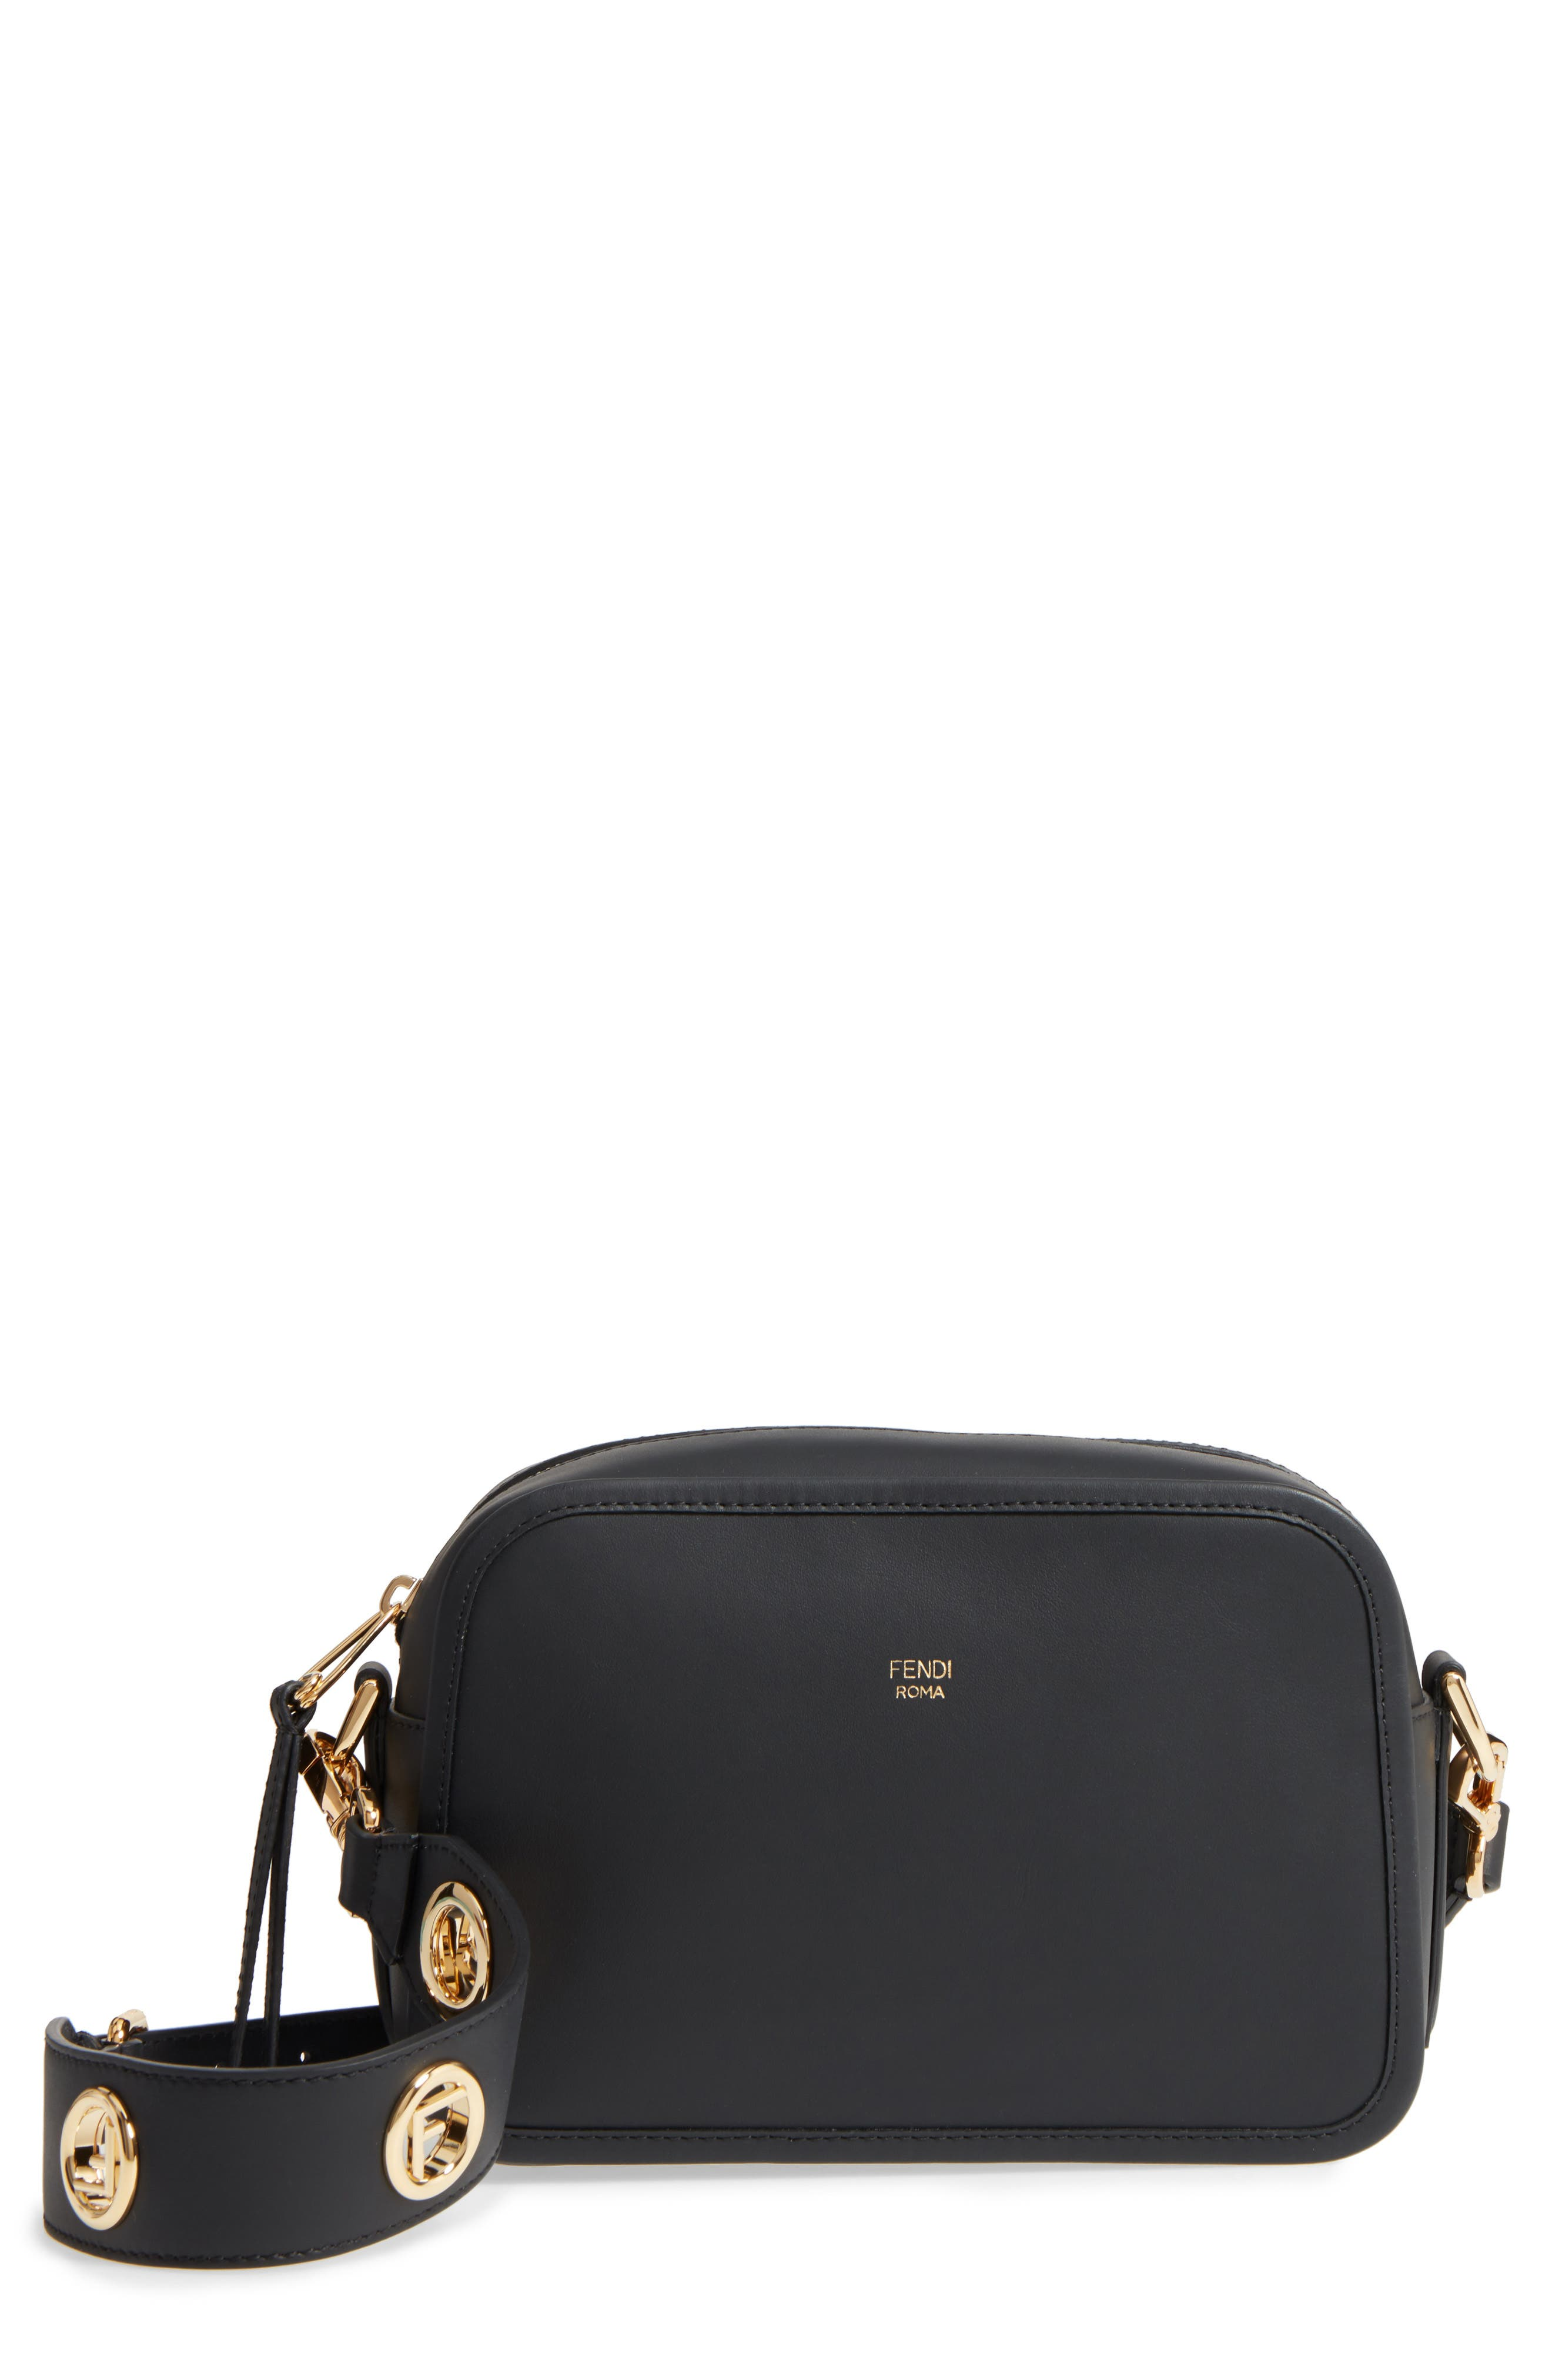 Fendi Logo Leather Camera Bag